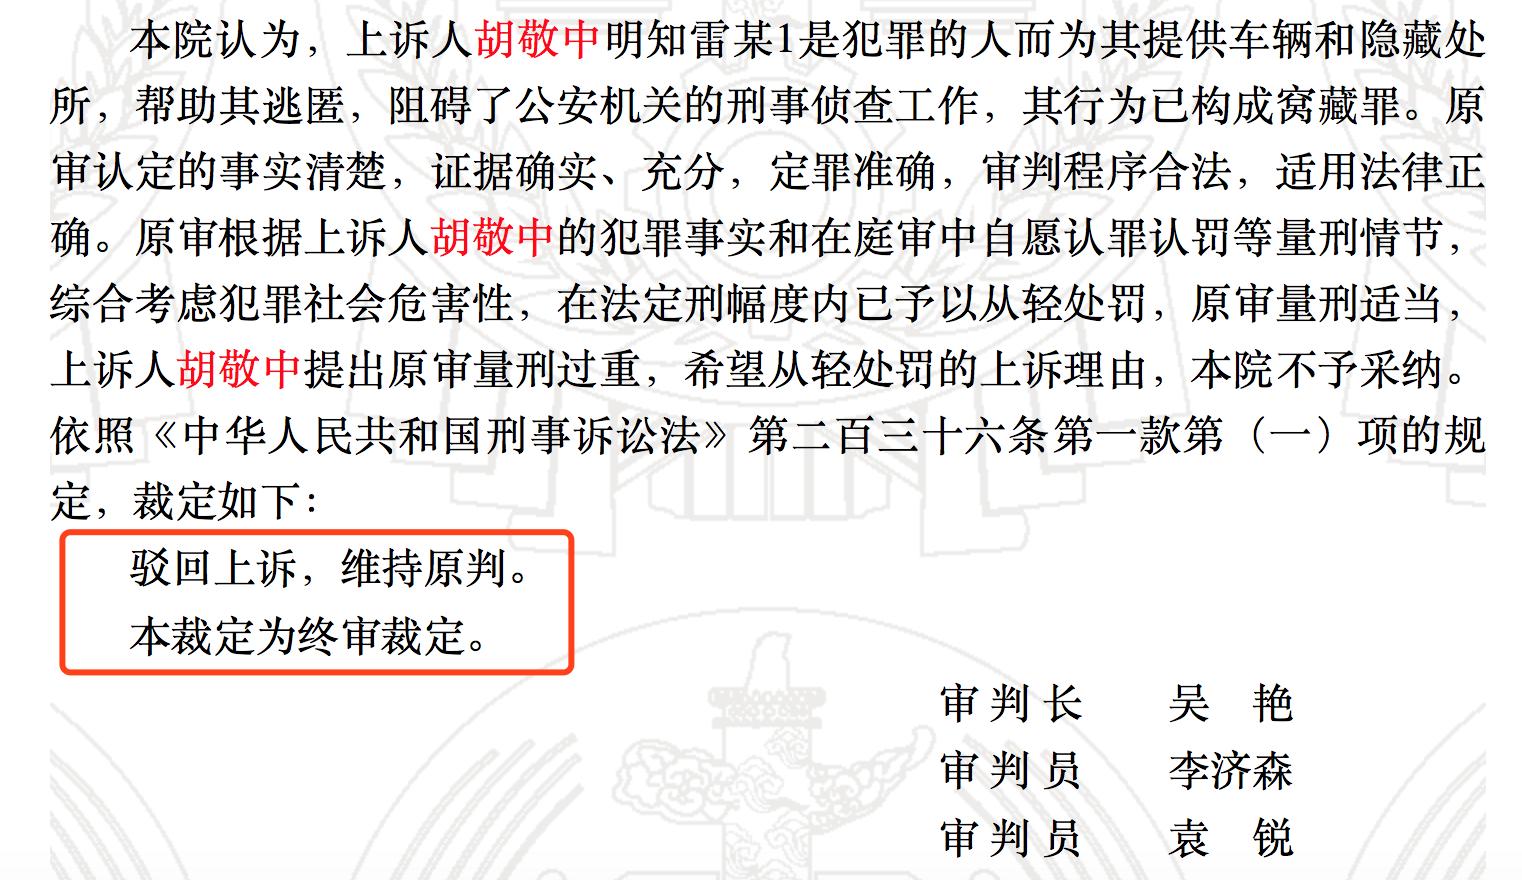 www.jb0044.com-男子与的哥斗狠身亡最新消息!检方:的哥不构成犯罪建议撤案